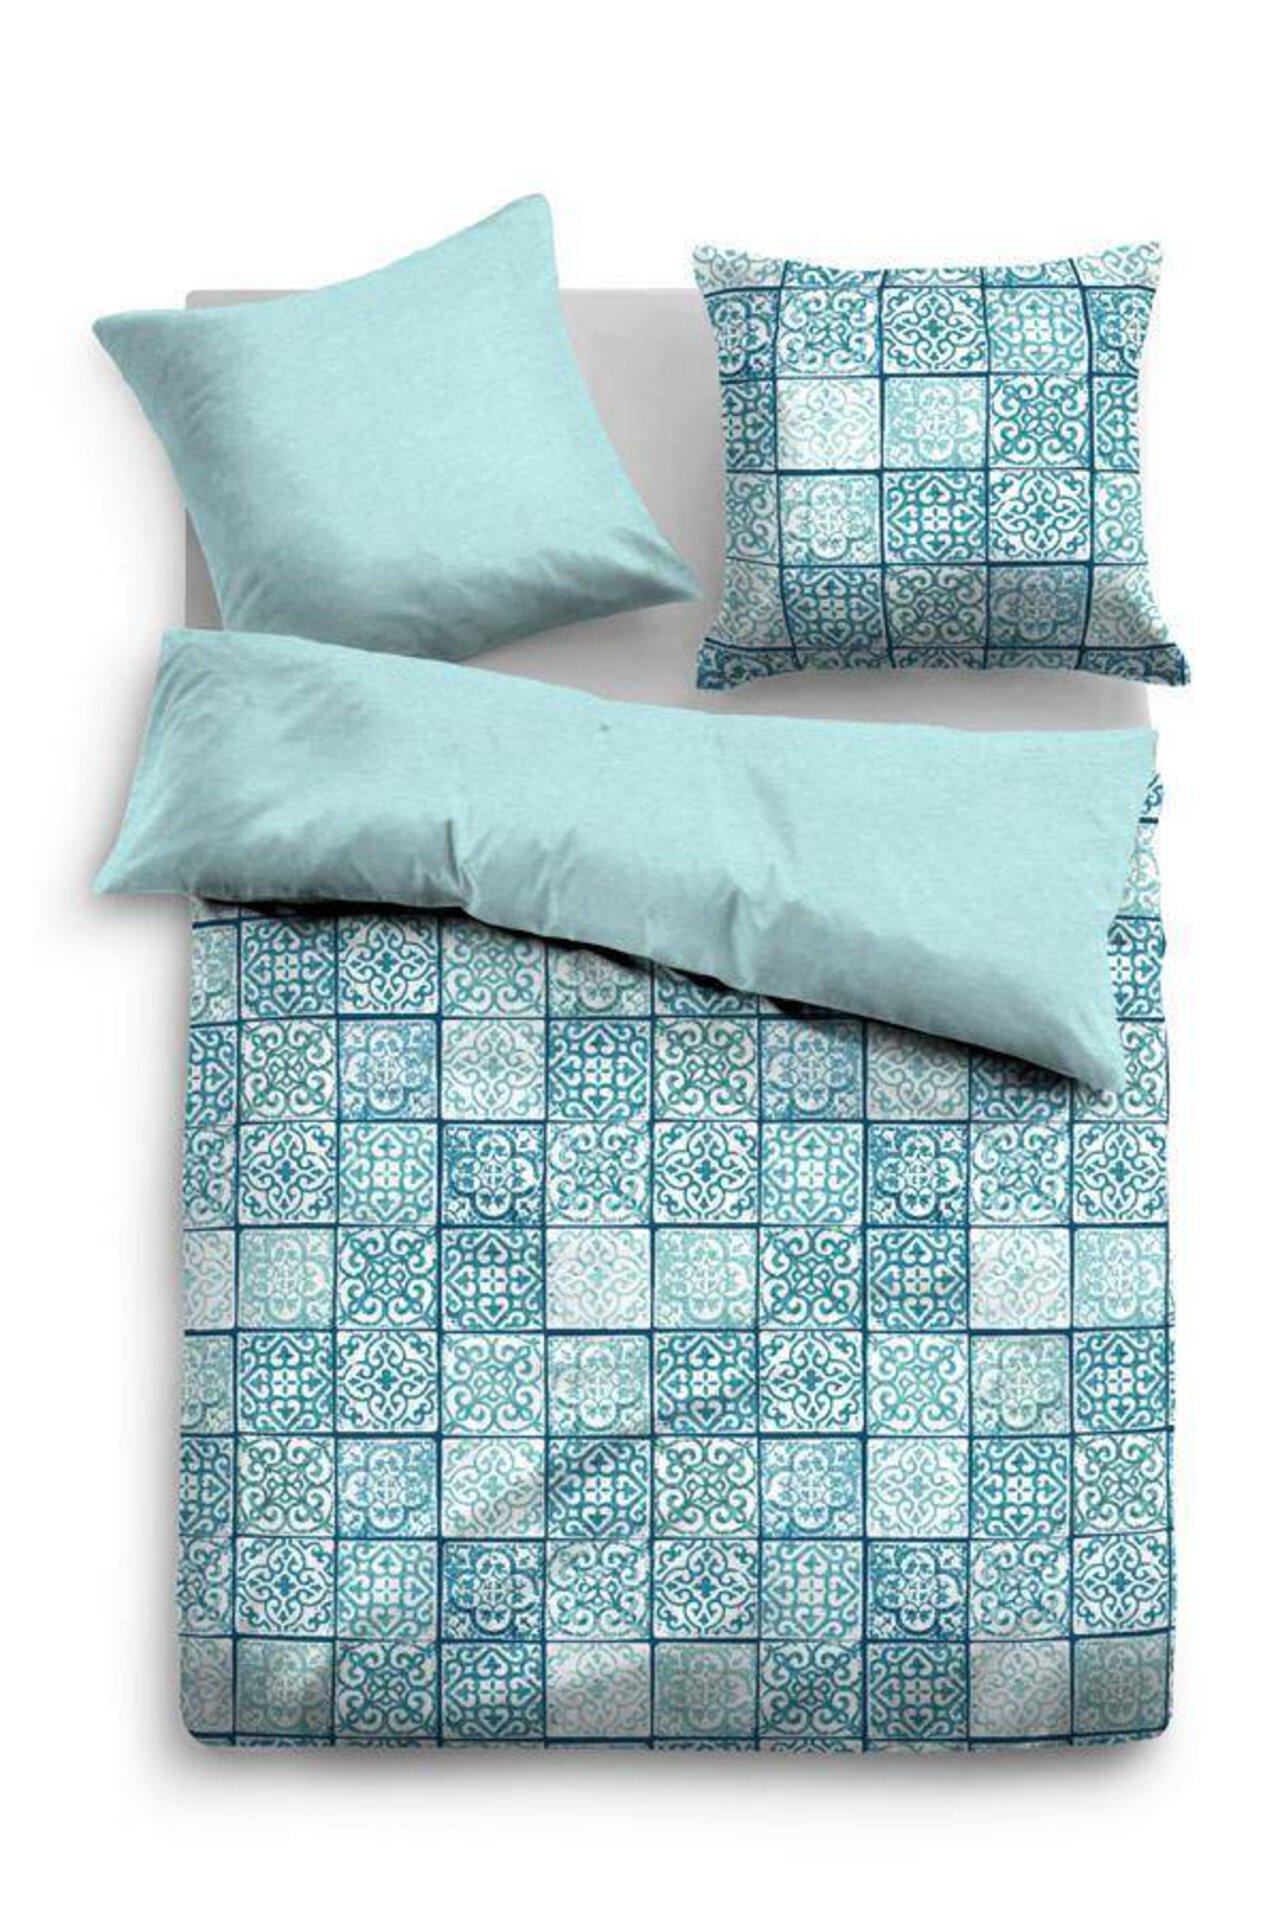 Satin-Bettwäsche Patchwork Ornamente Tom Tailor Textil Blau 135 x 200 cm